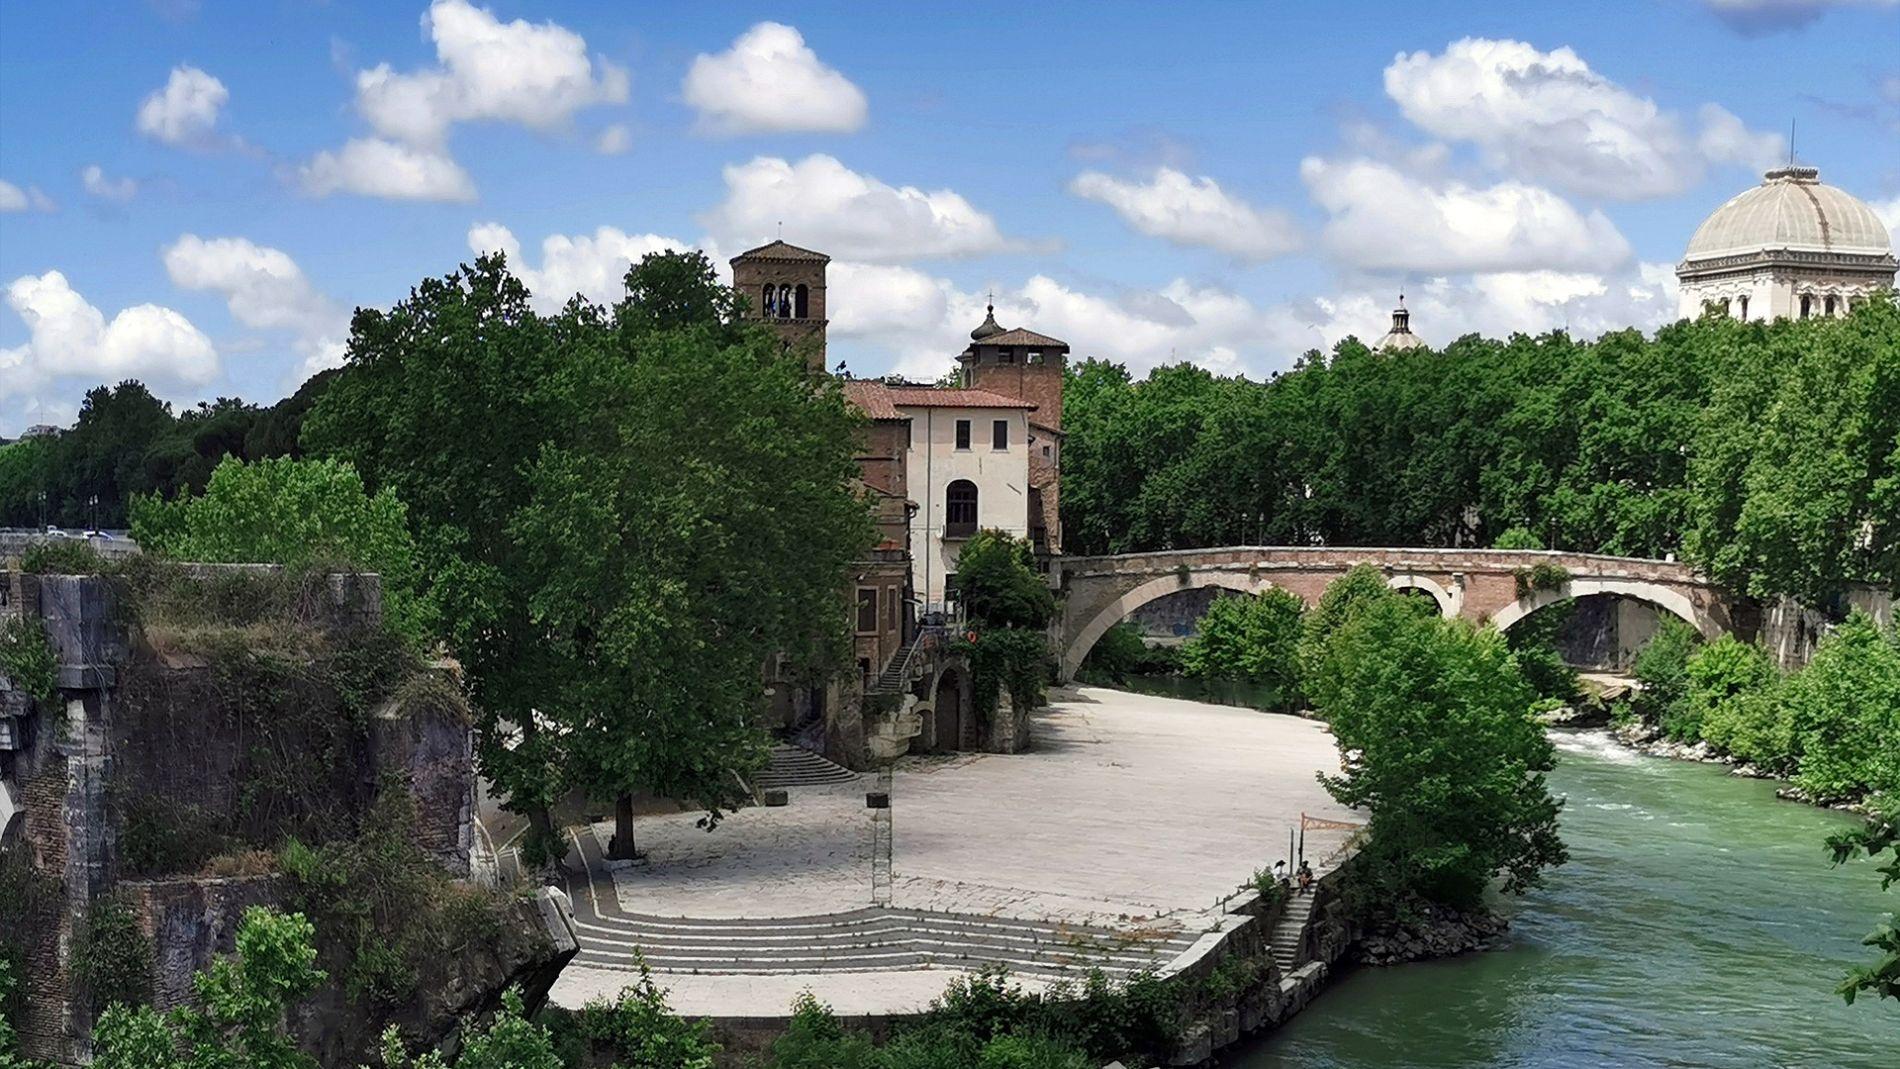 Tiber, Roma